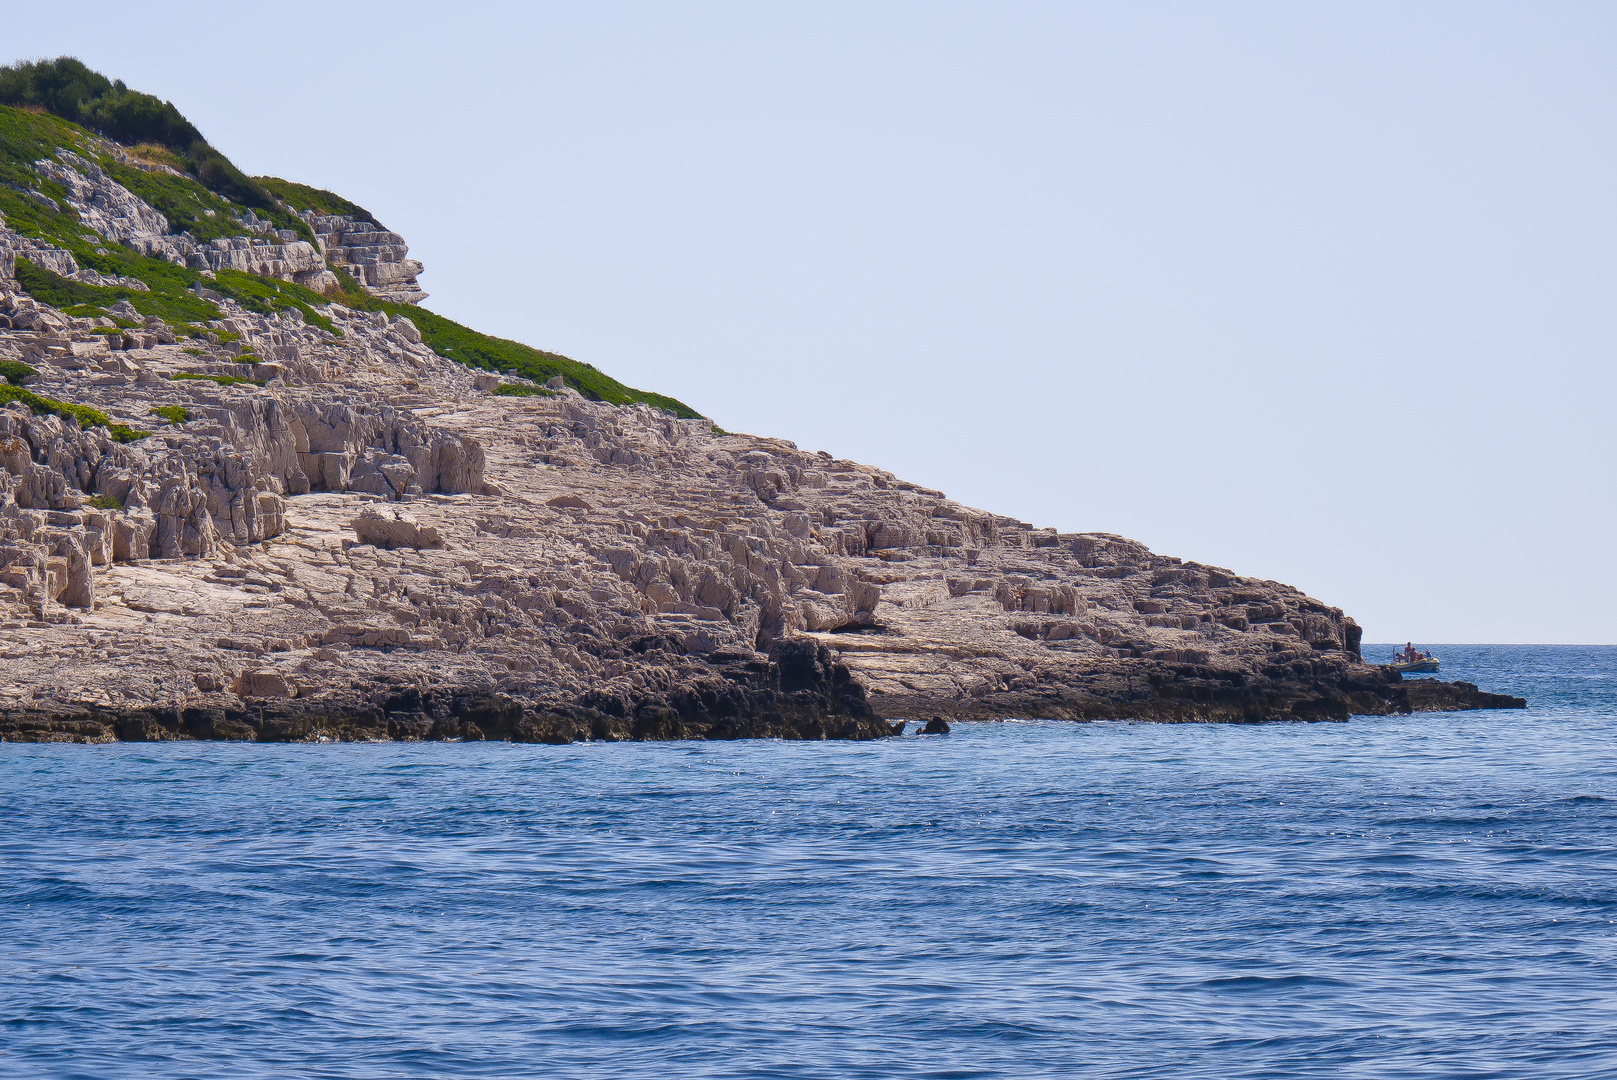 Insel bei Dugi Otok